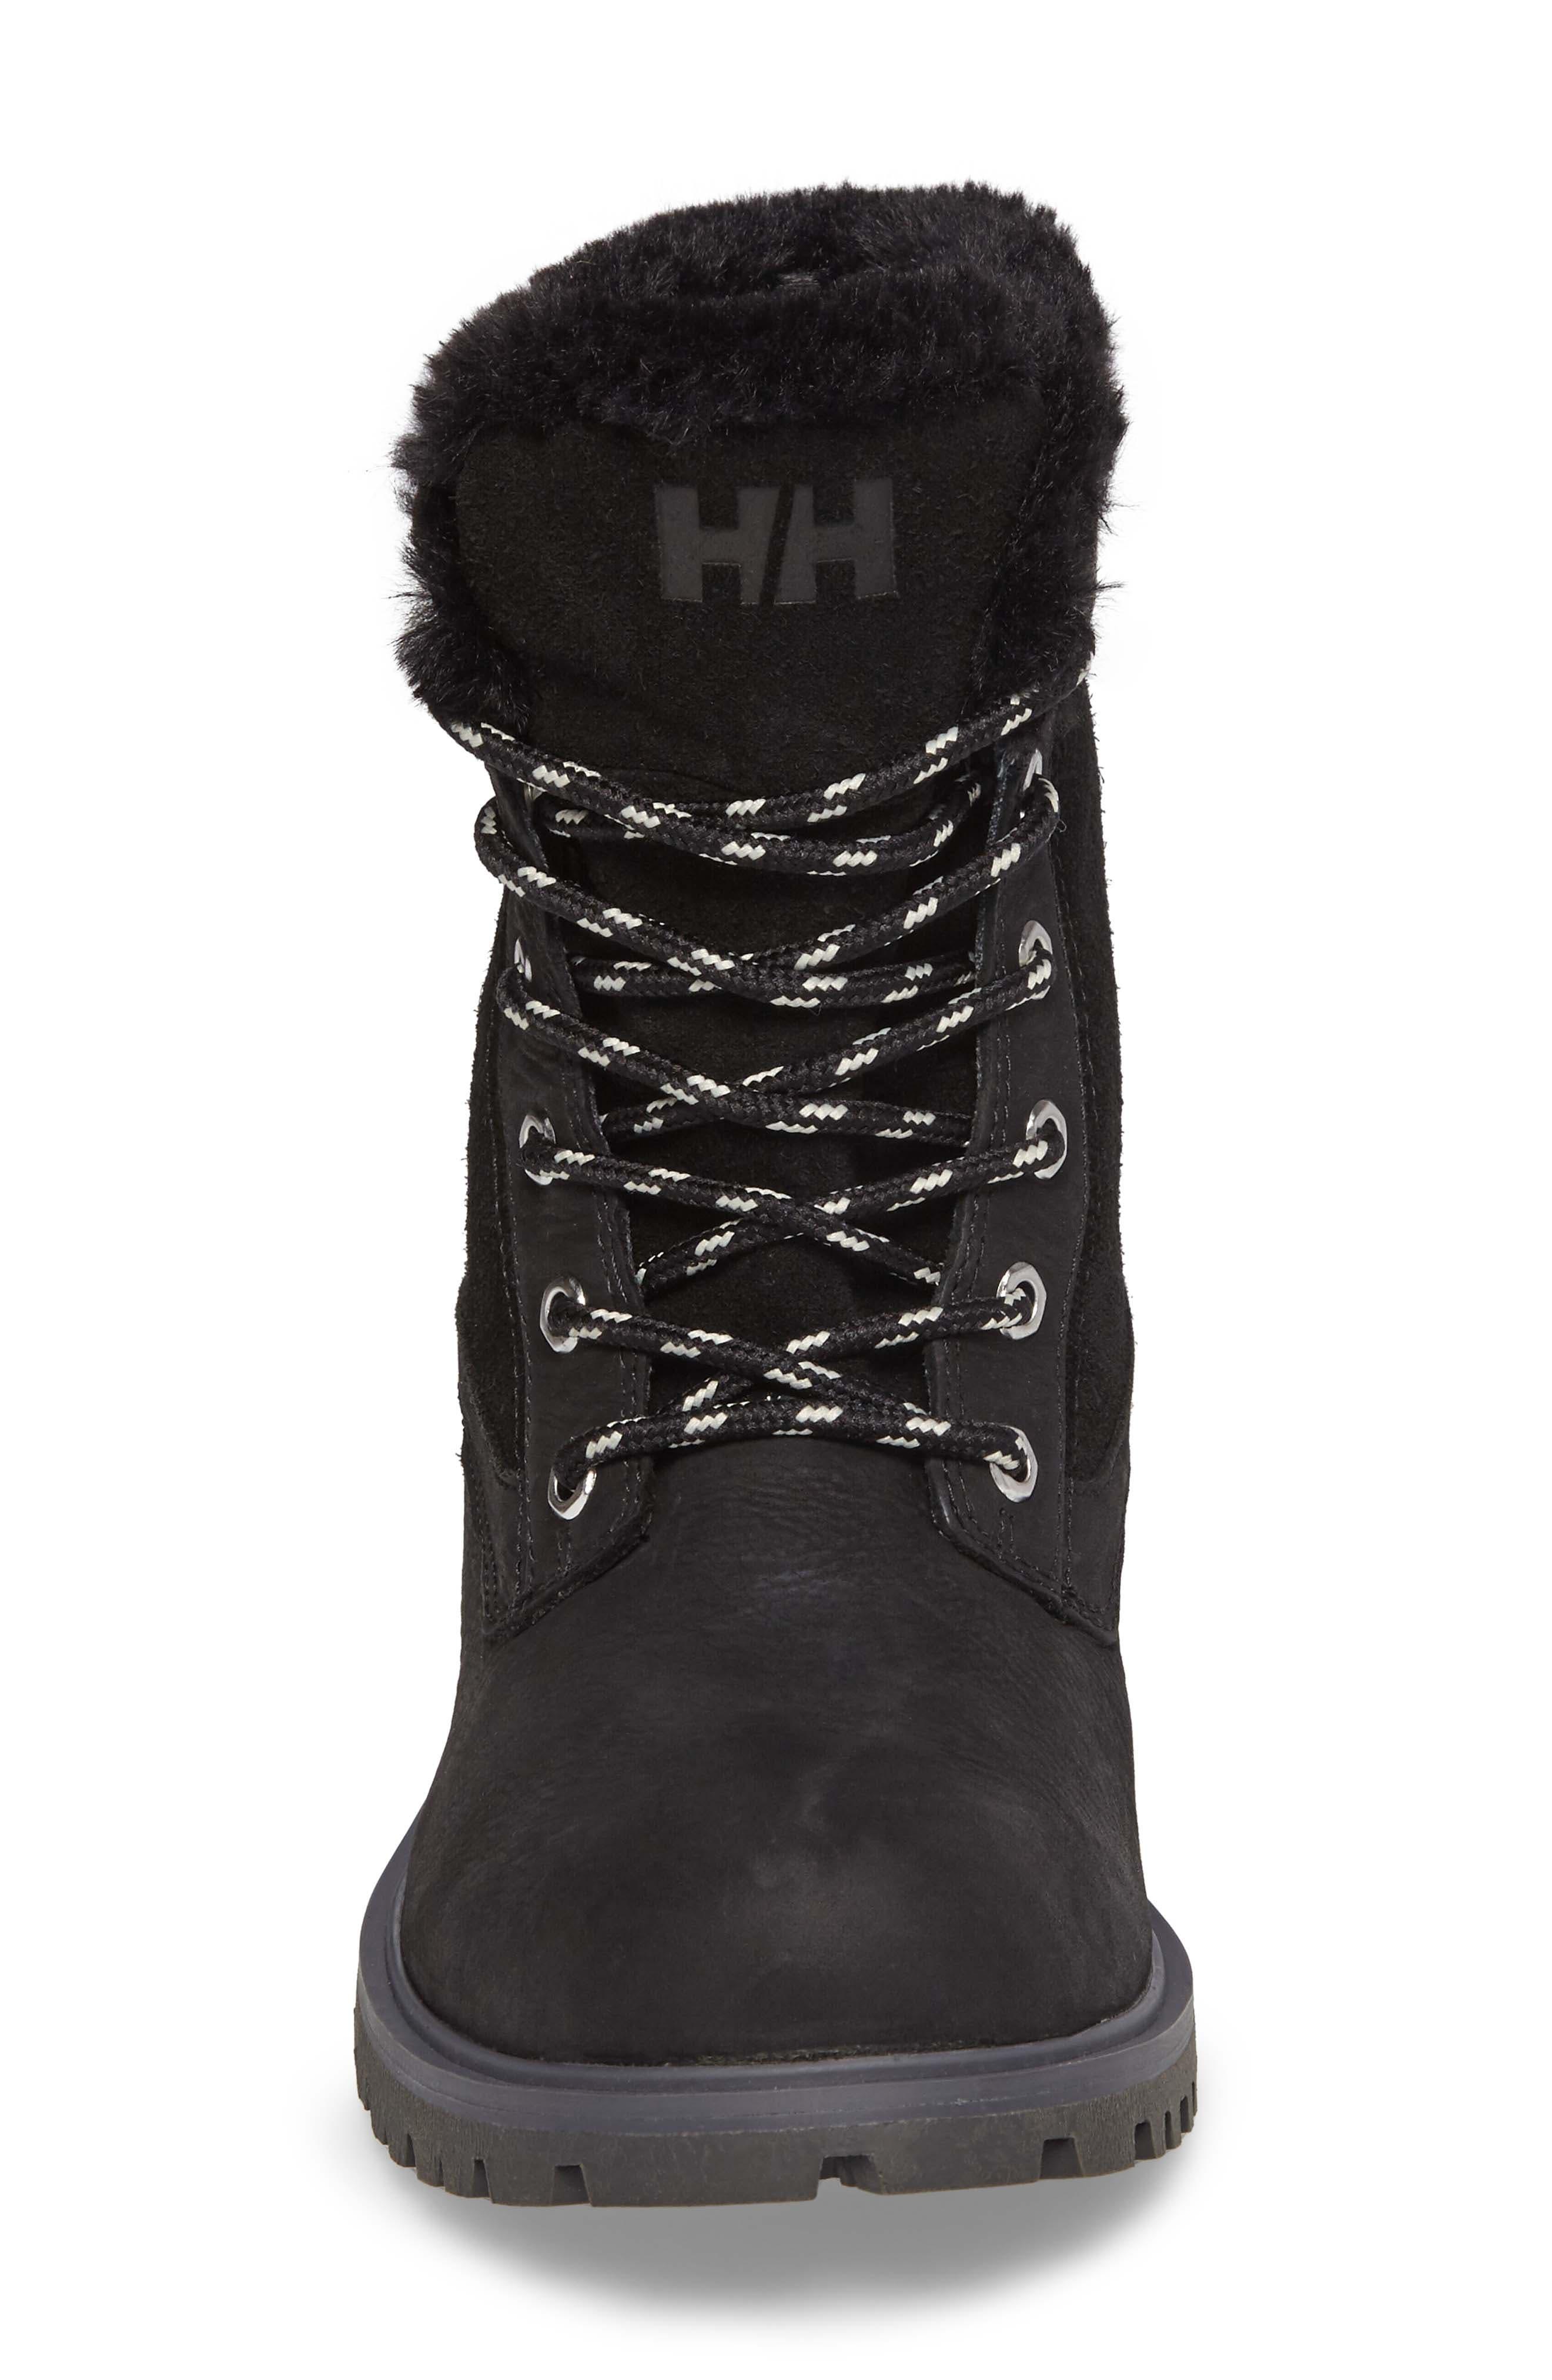 Marion Waterproof Winter Boot,                             Alternate thumbnail 4, color,                             Jet Black / Ebony / Black